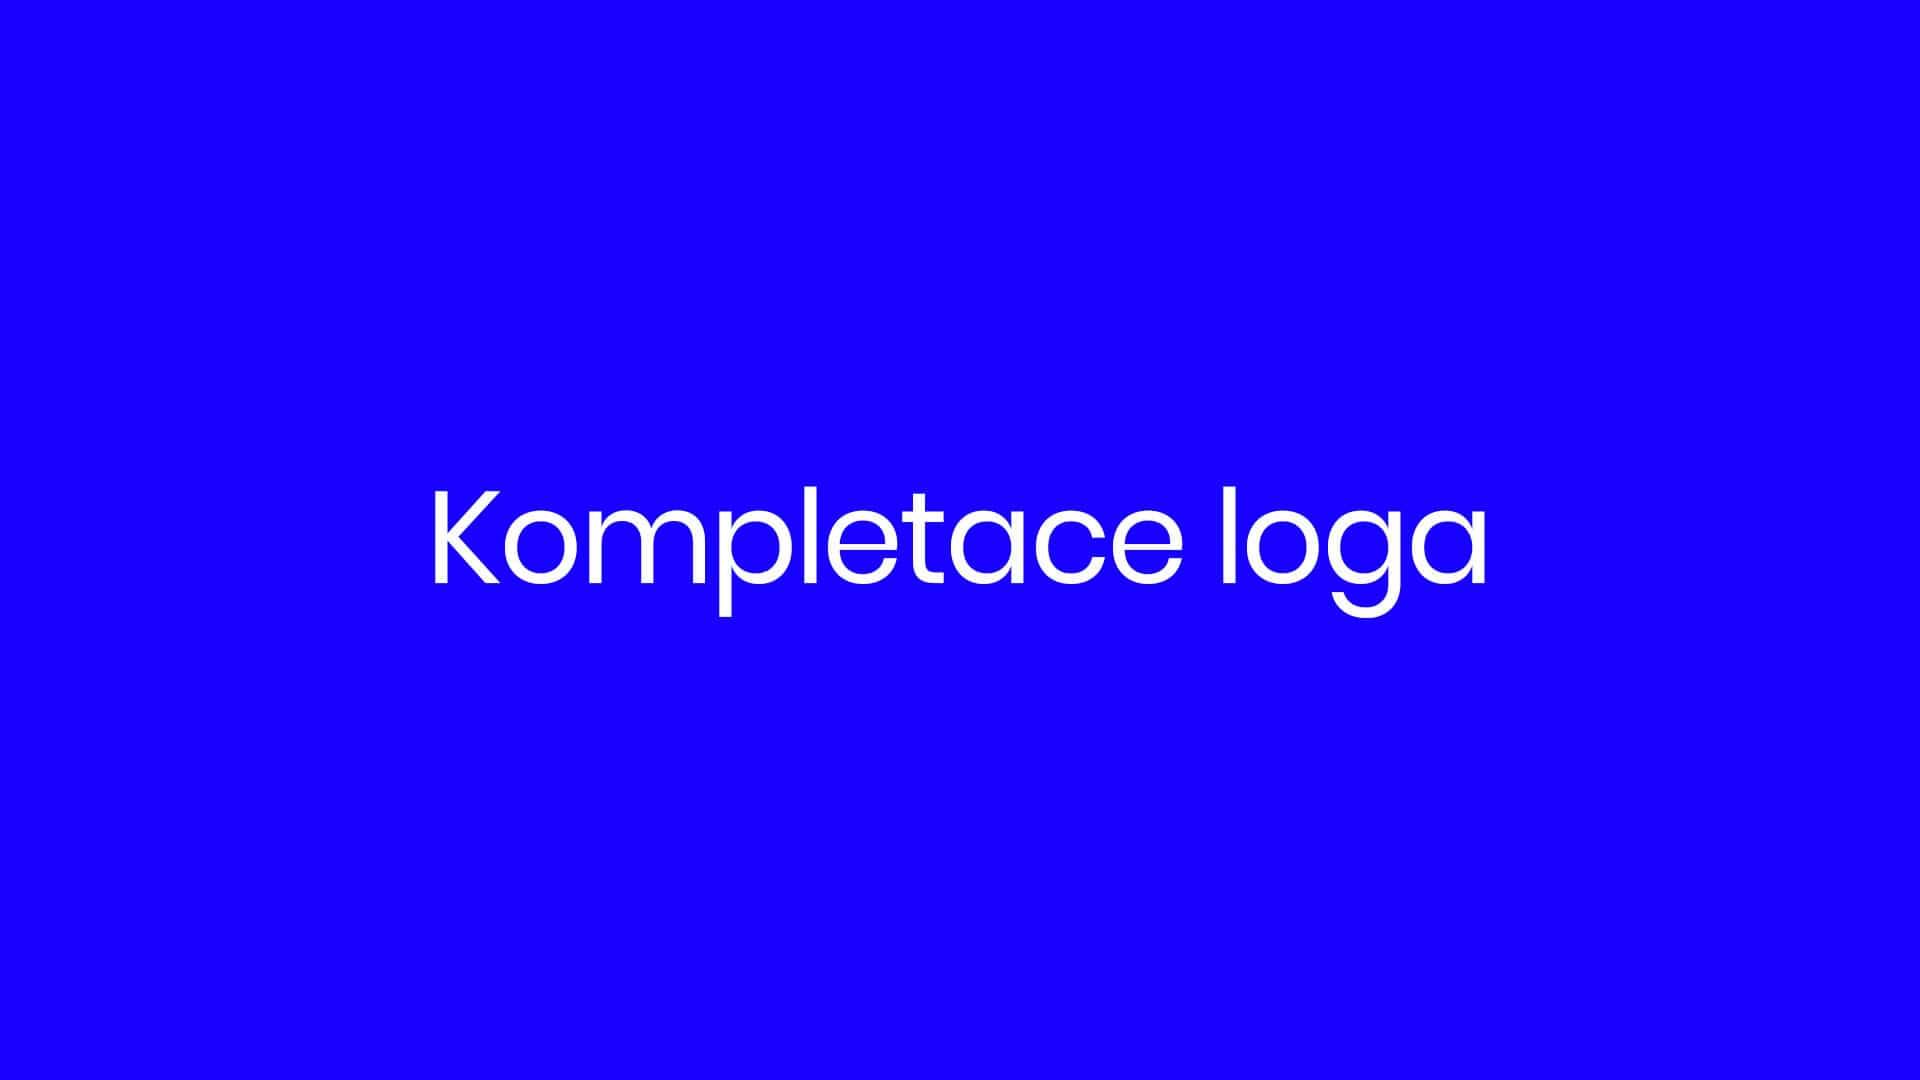 5. díl - kompletace loga